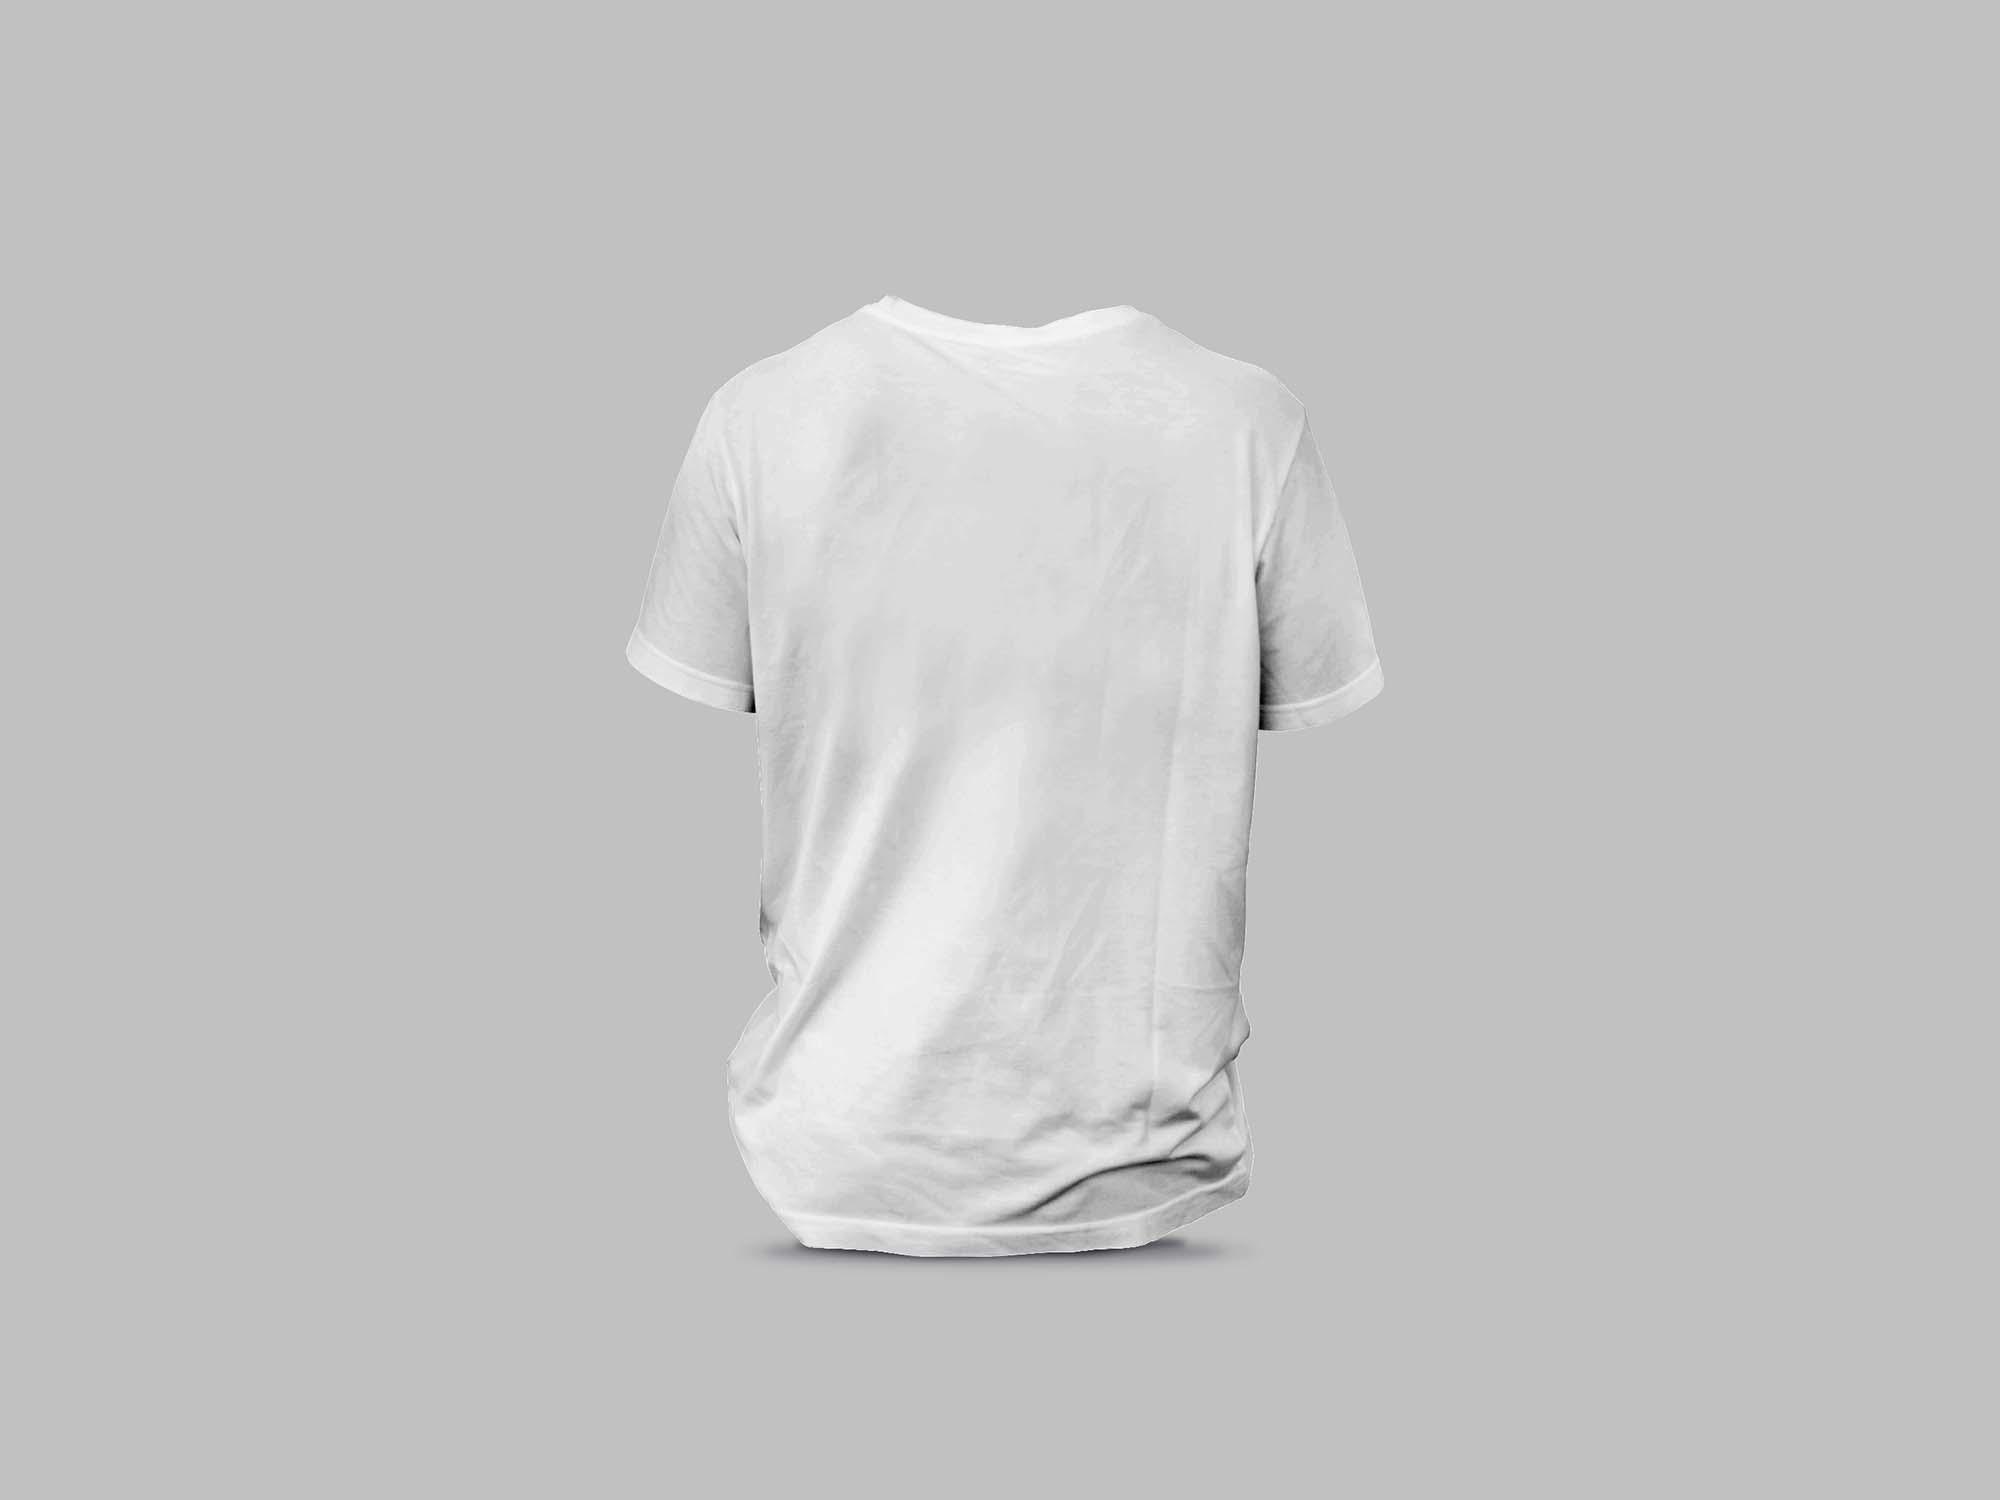 Backside T-Shirt Mockup 2